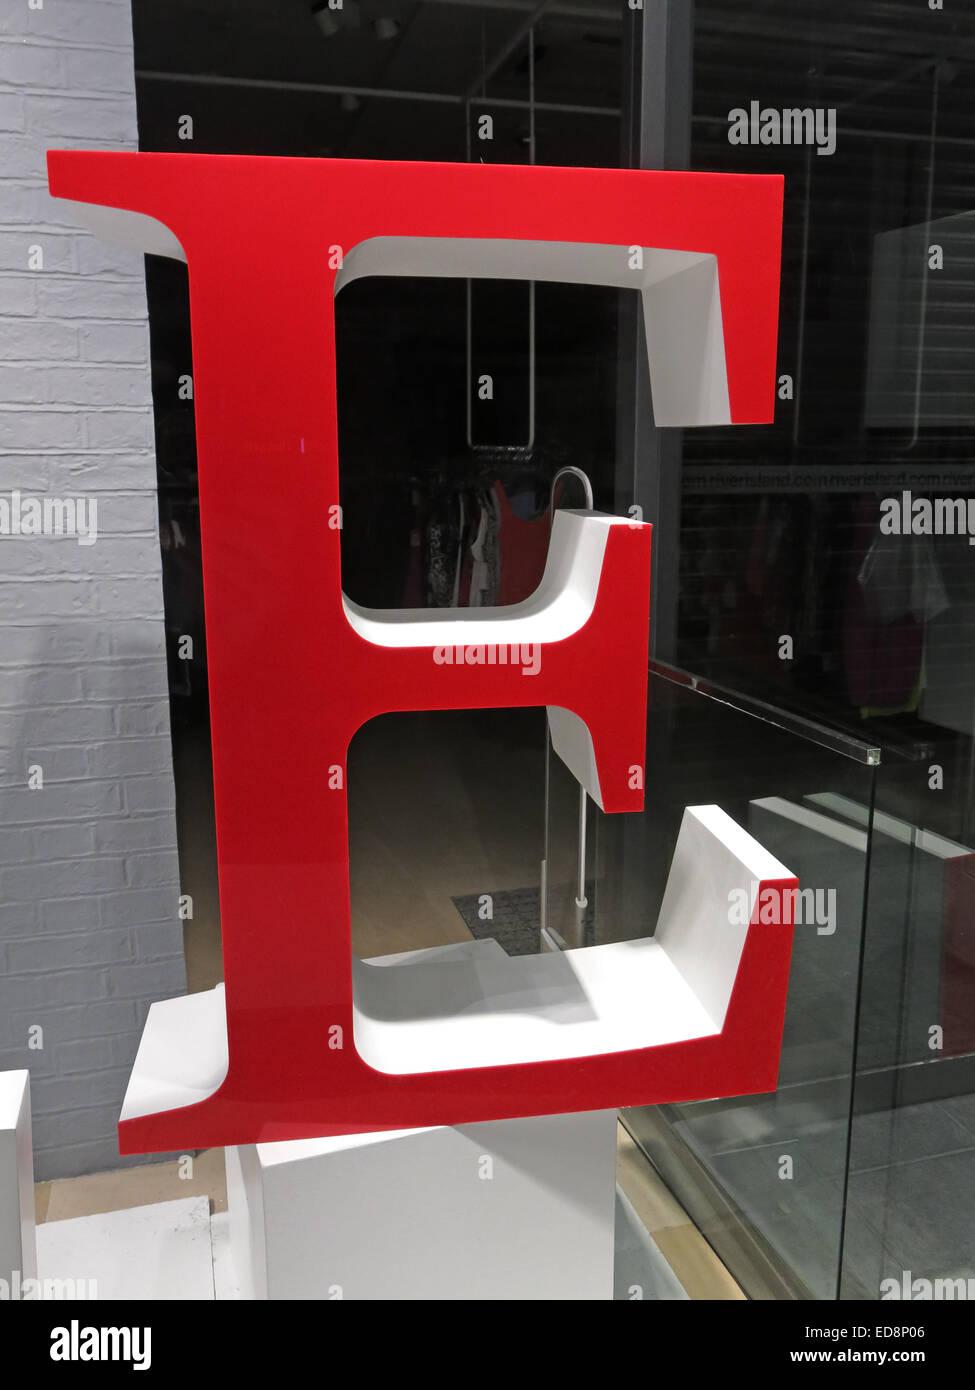 Character ASCII Edinburgh,Scotland,UK White giant letters glass window,GoTonySmith